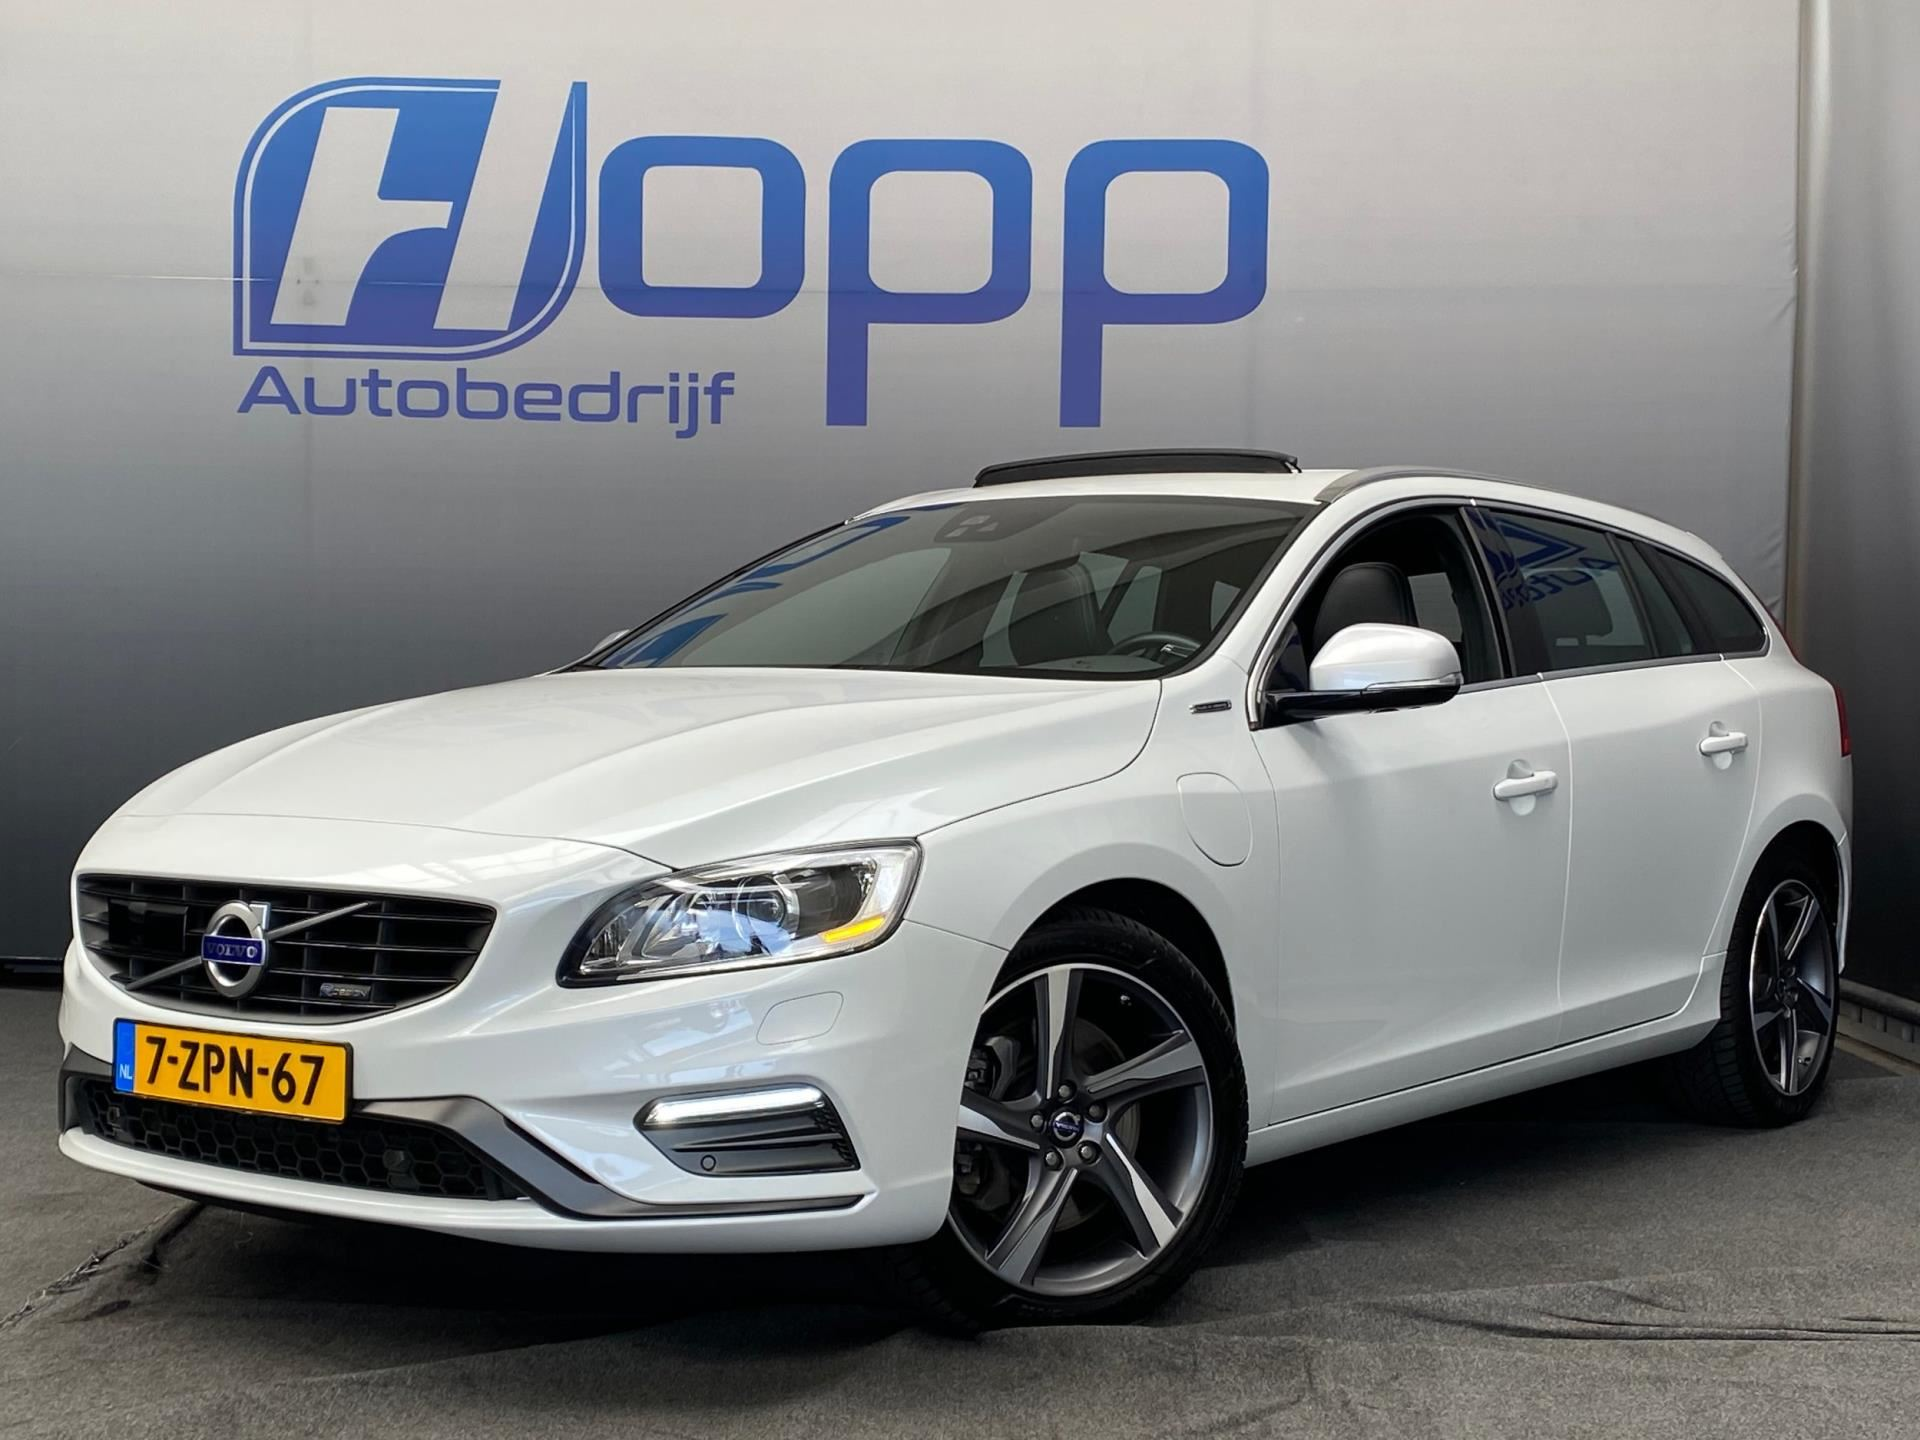 Volvo V60 occasion - Autobedrijf HOPP